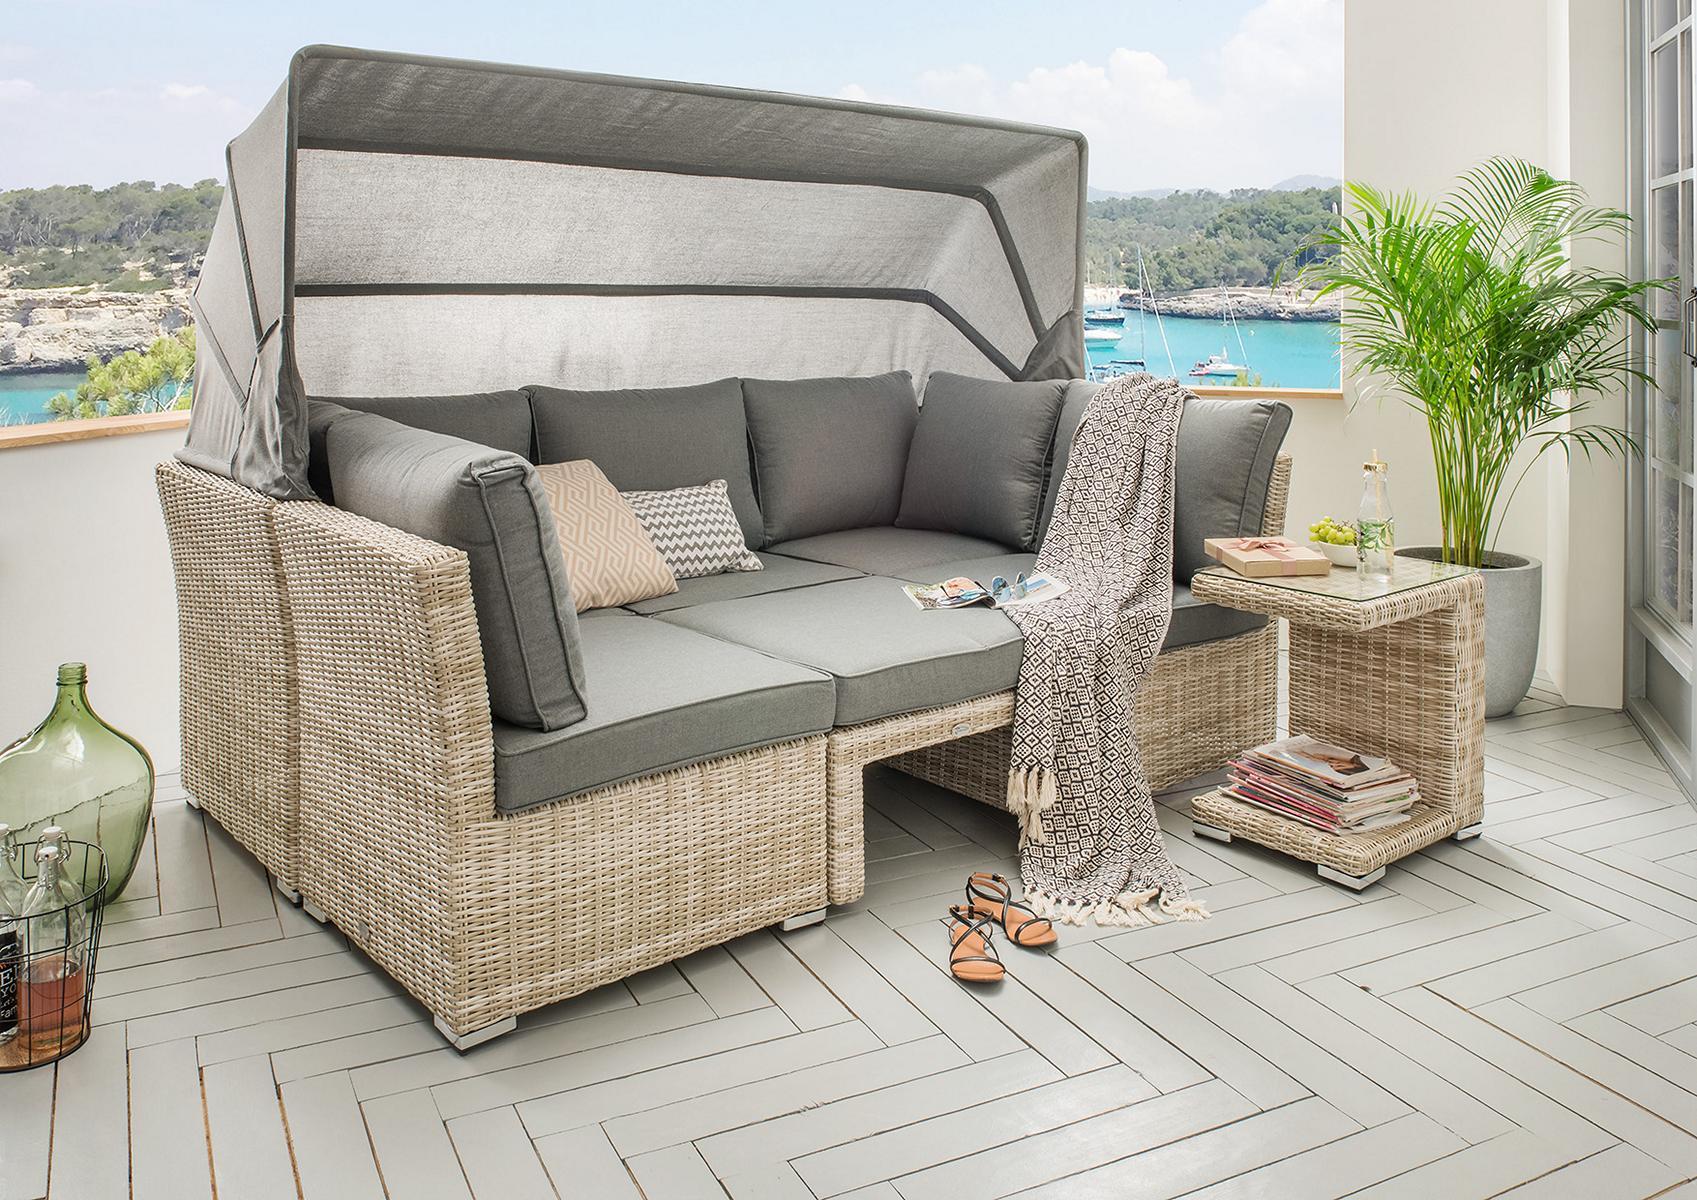 Magnificent Geflechtmobel Fur Garten Zuhause Hochwertige Gartenmobel Cjindustries Chair Design For Home Cjindustriesco